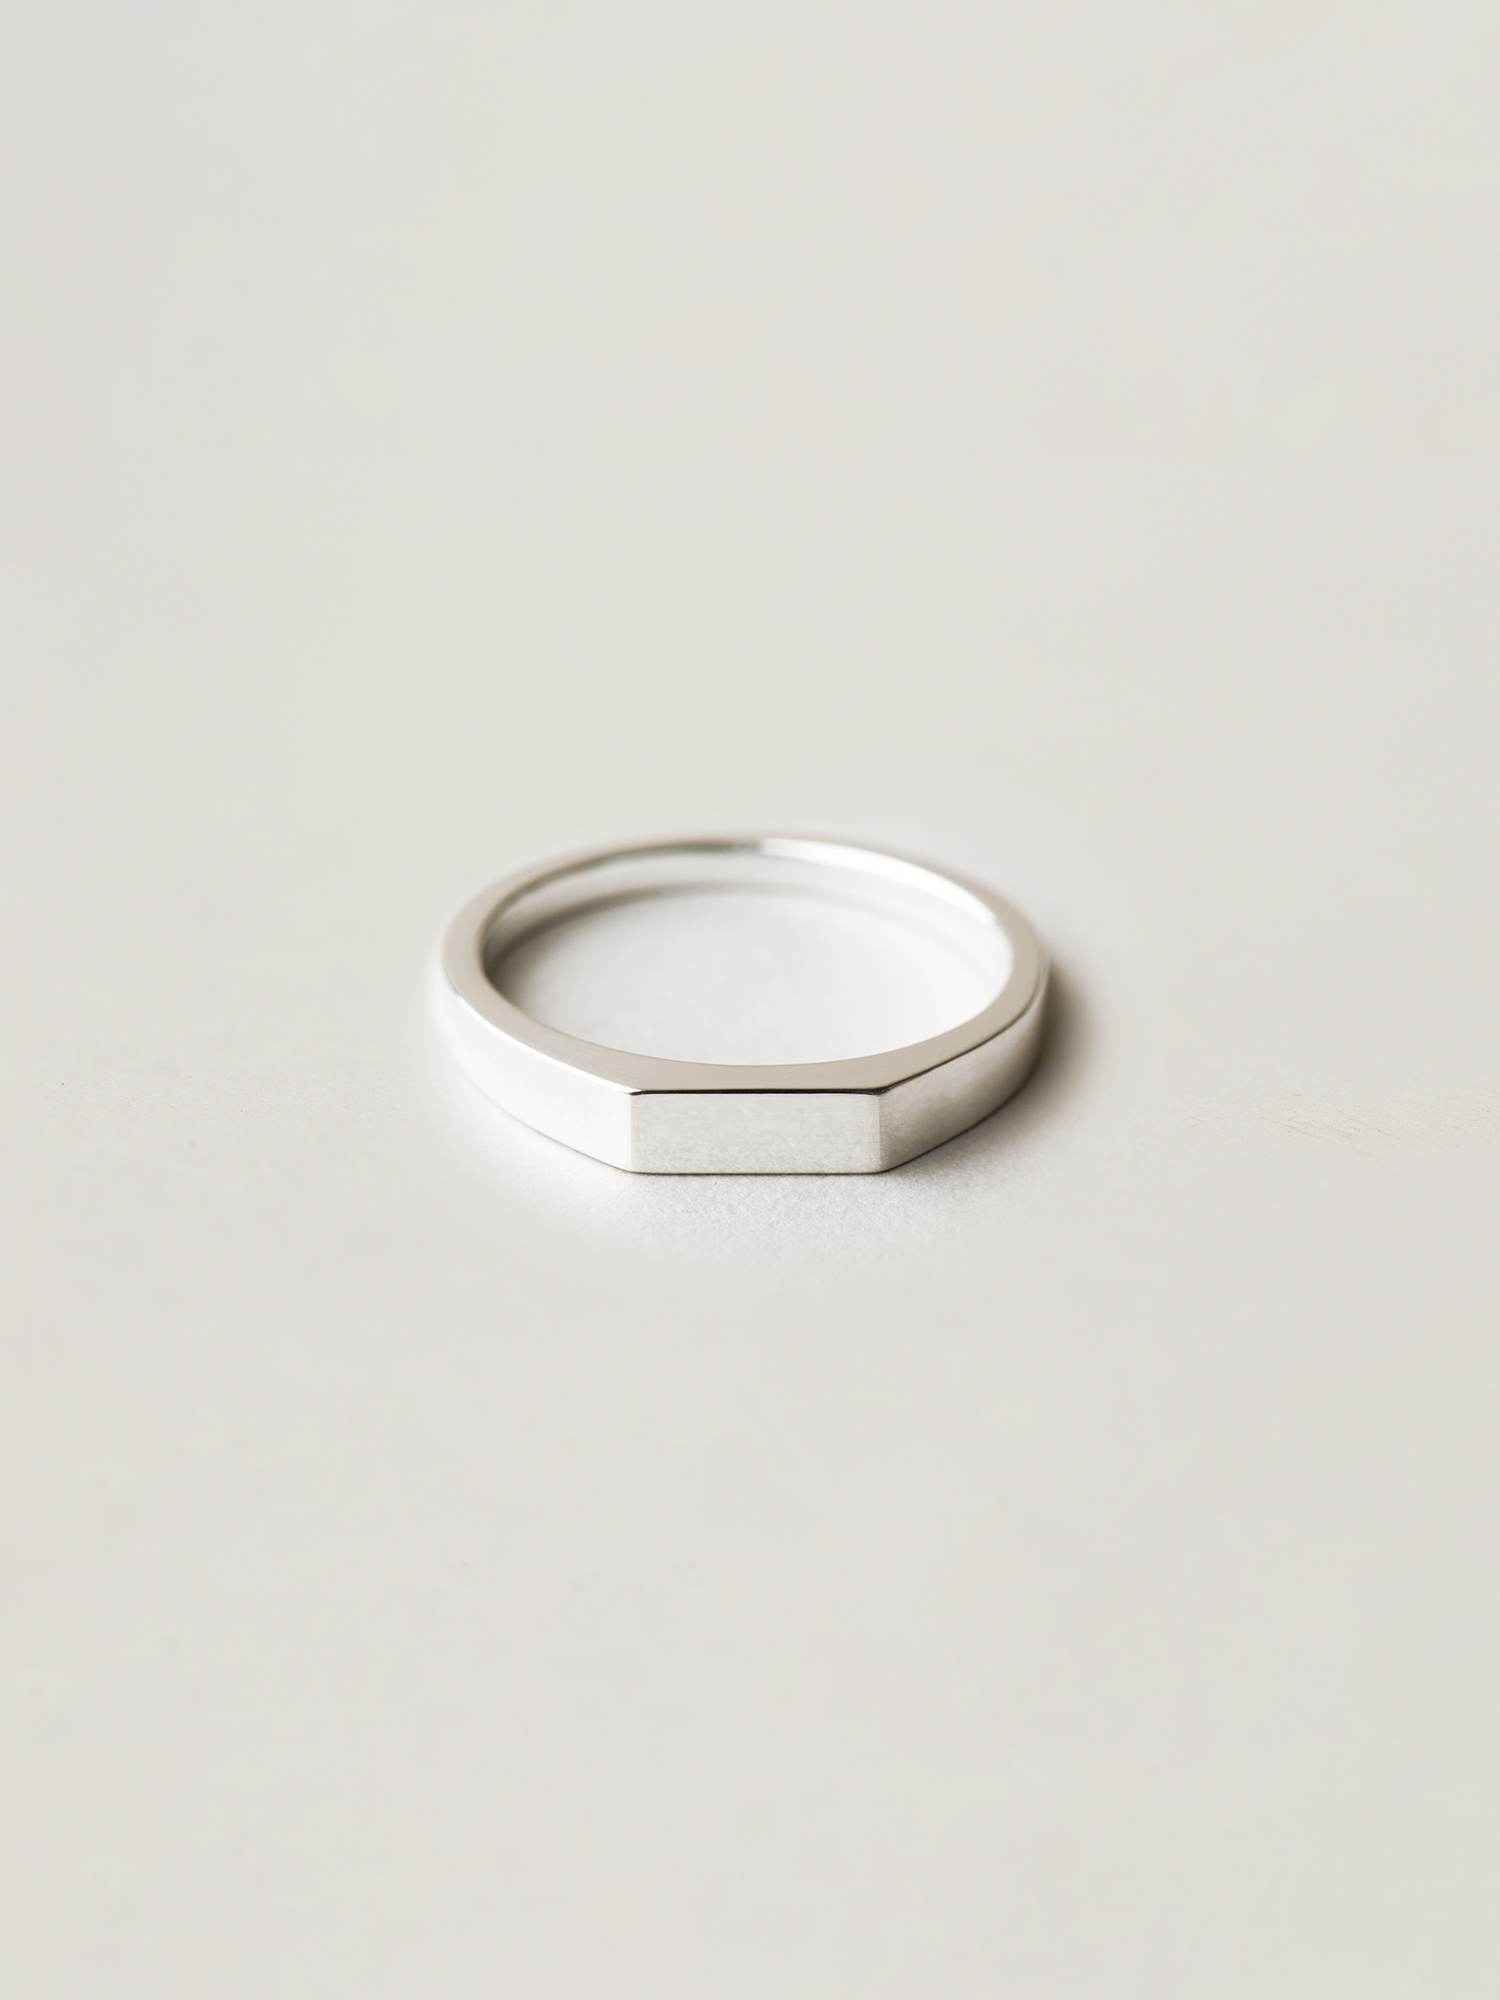 Christina-Pauls-Siegelring-Verlobungsring-Silber2.jpg